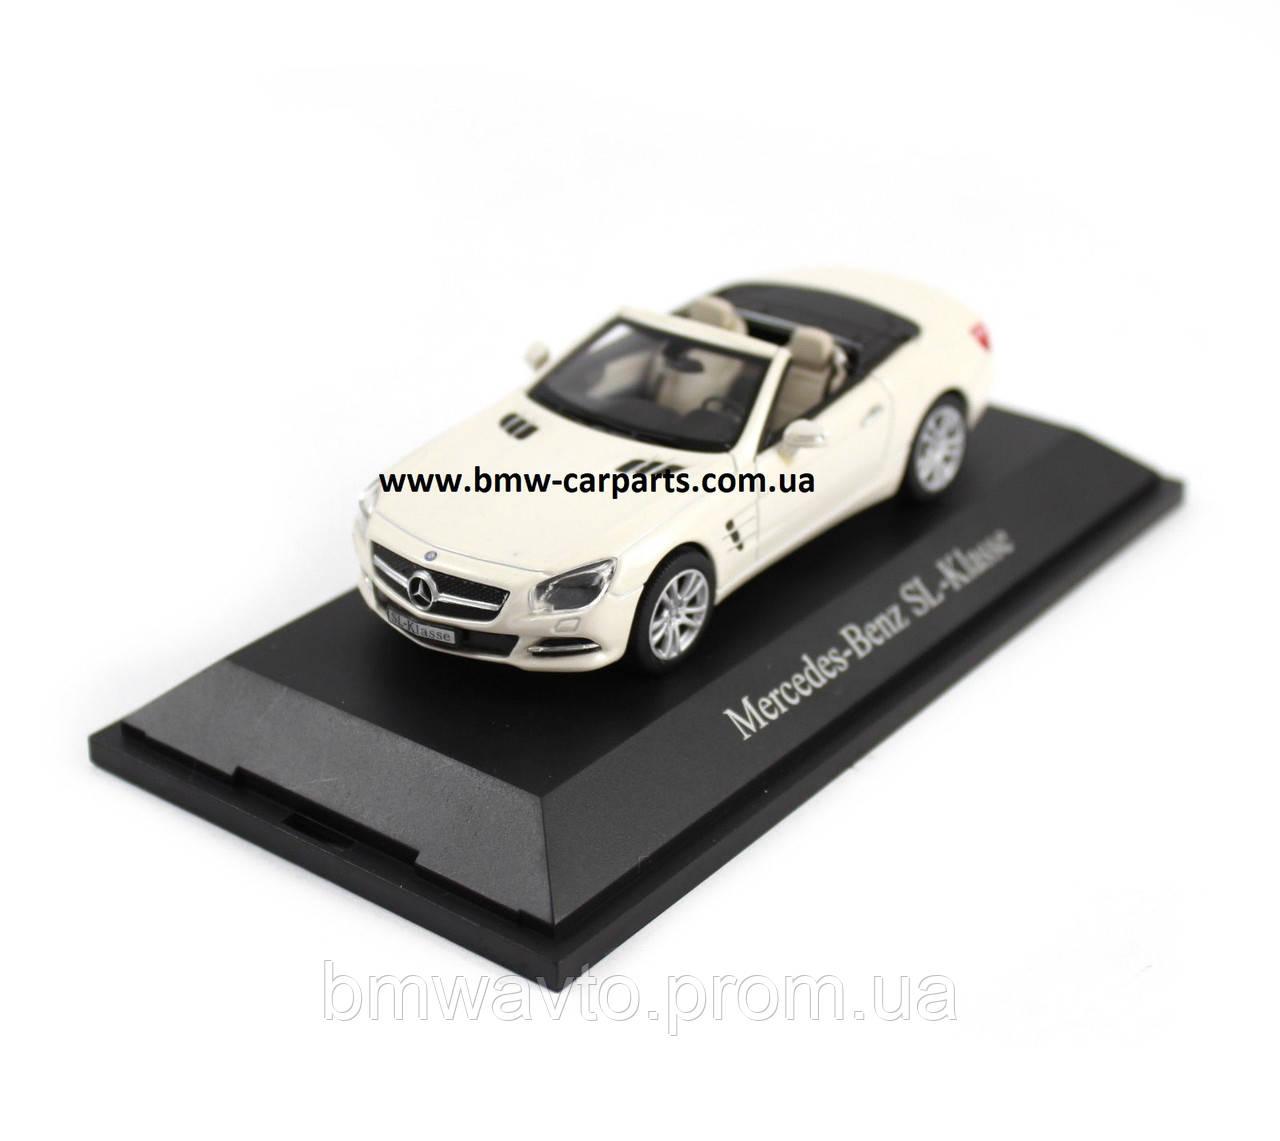 Модель Mercedes-Benz SL-Class R231, 1:43 Scale